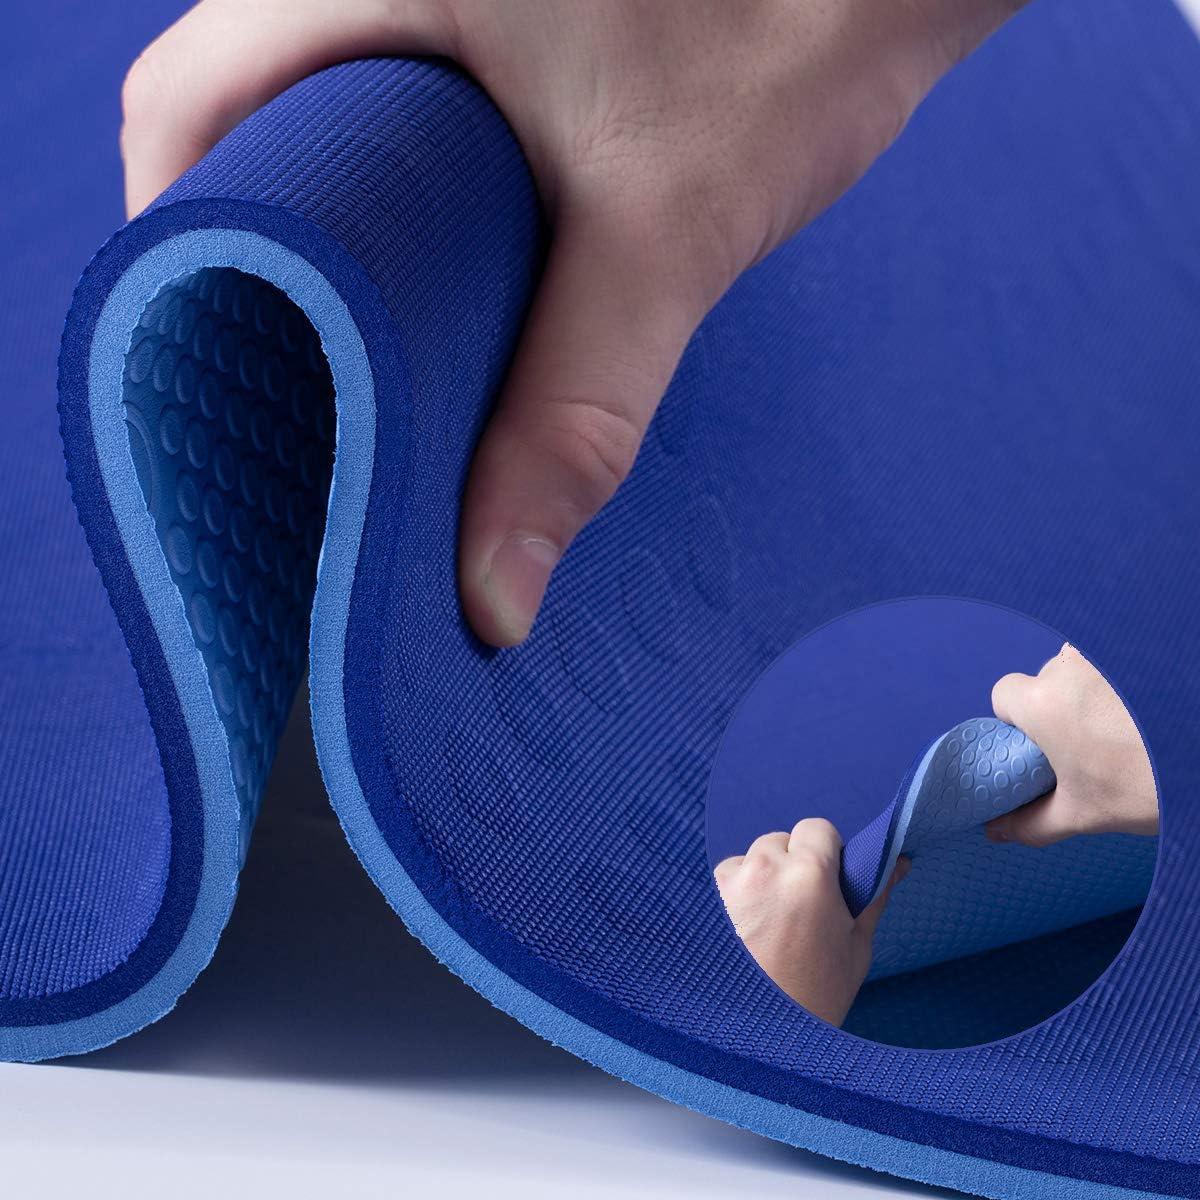 JELS Extra Thick Yoga Mat 2 Chicago Mall 5 inch Non Direct stock discount Slip 3D Ergonomic Desig